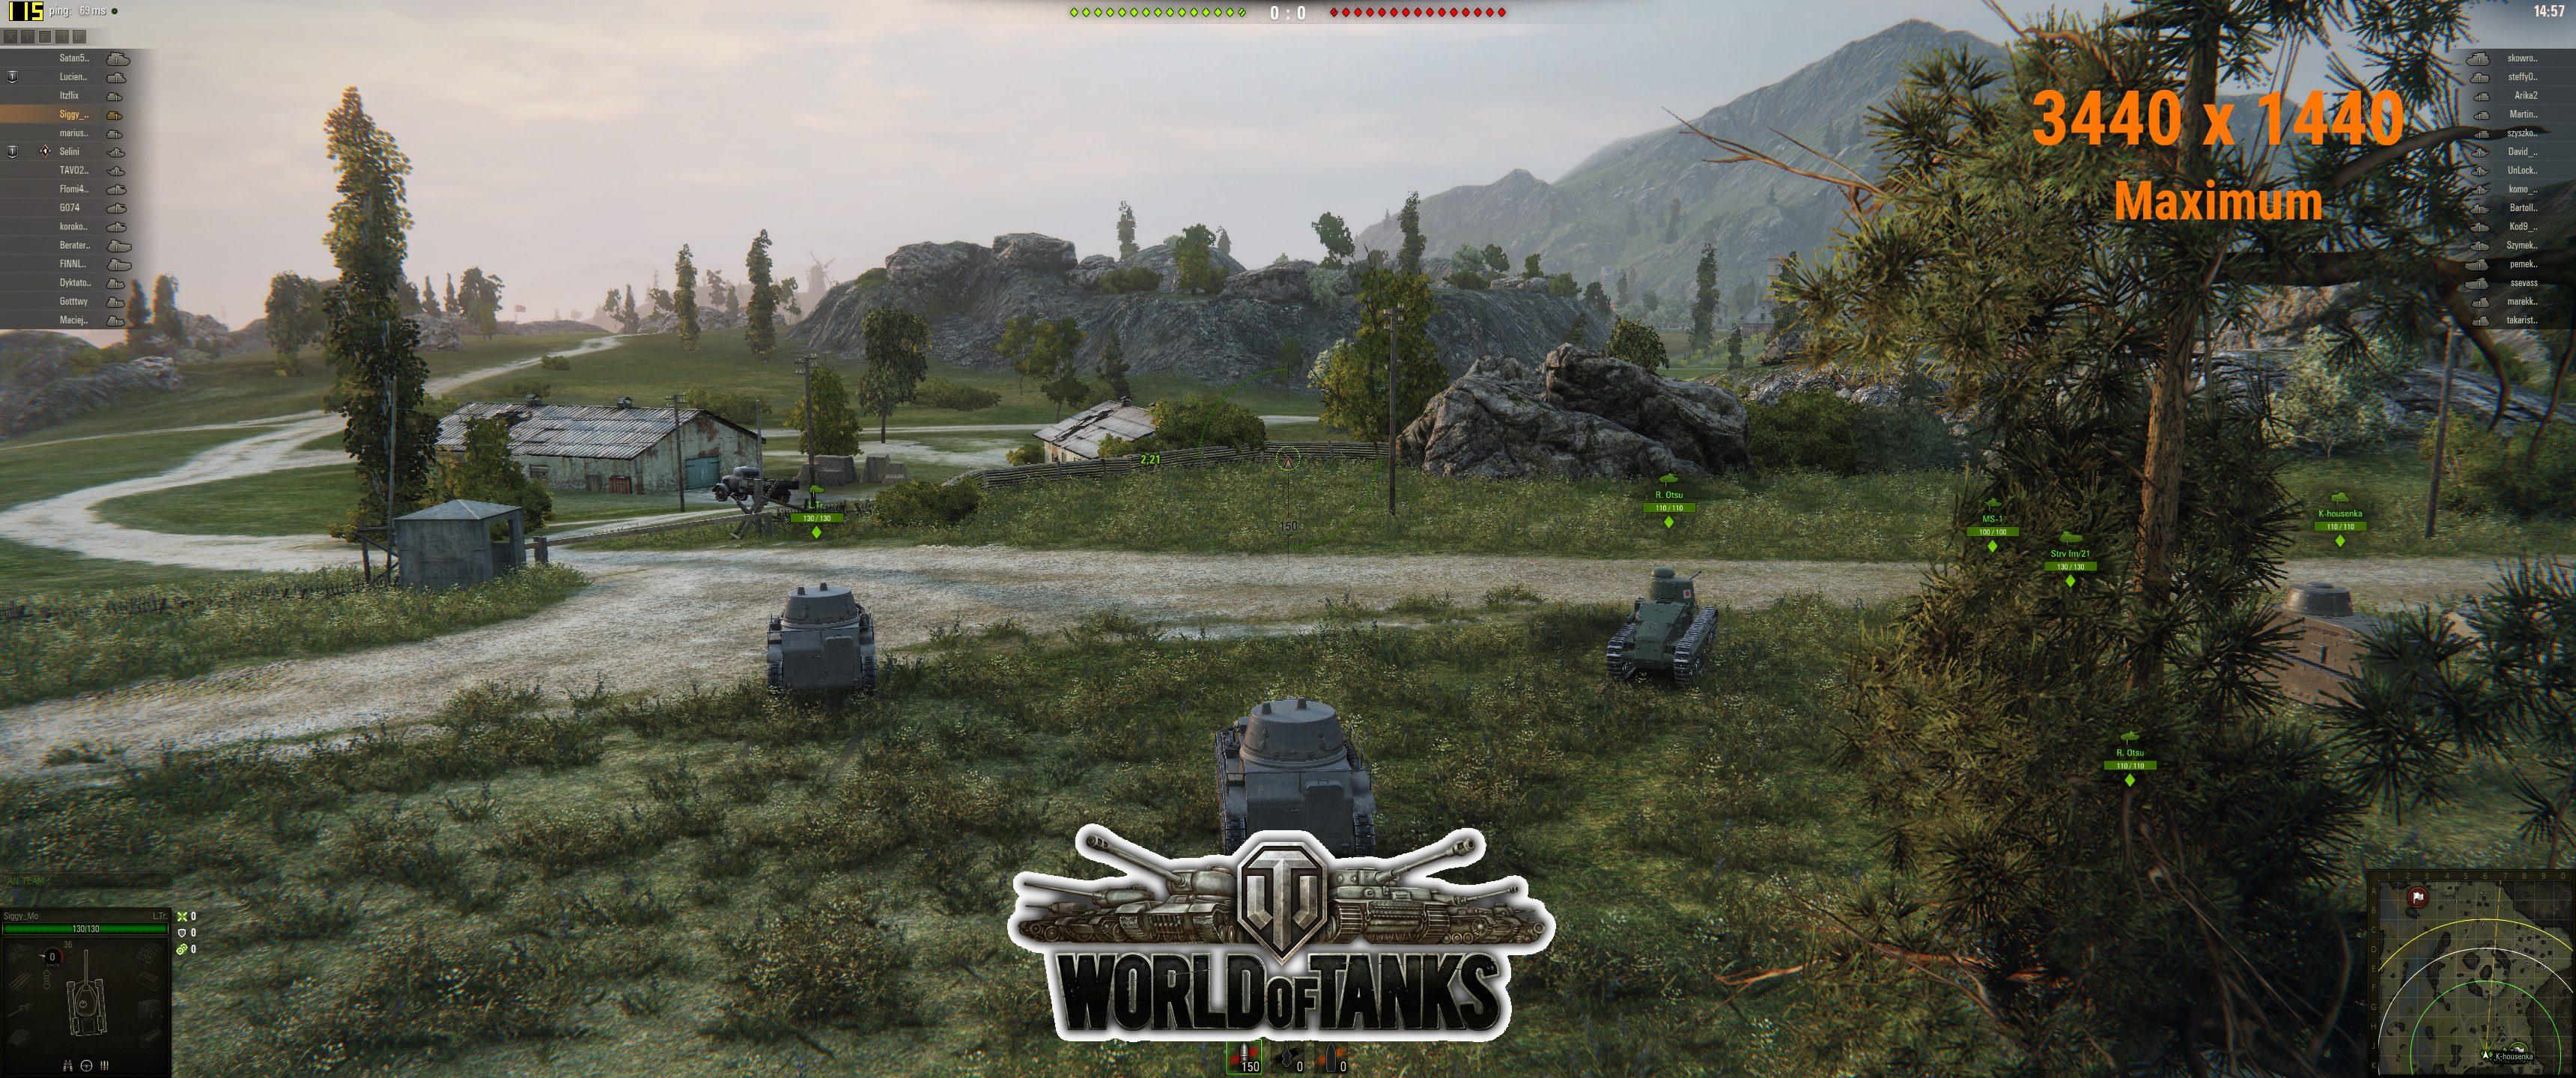 Game-8-3440-World-of-Tanks